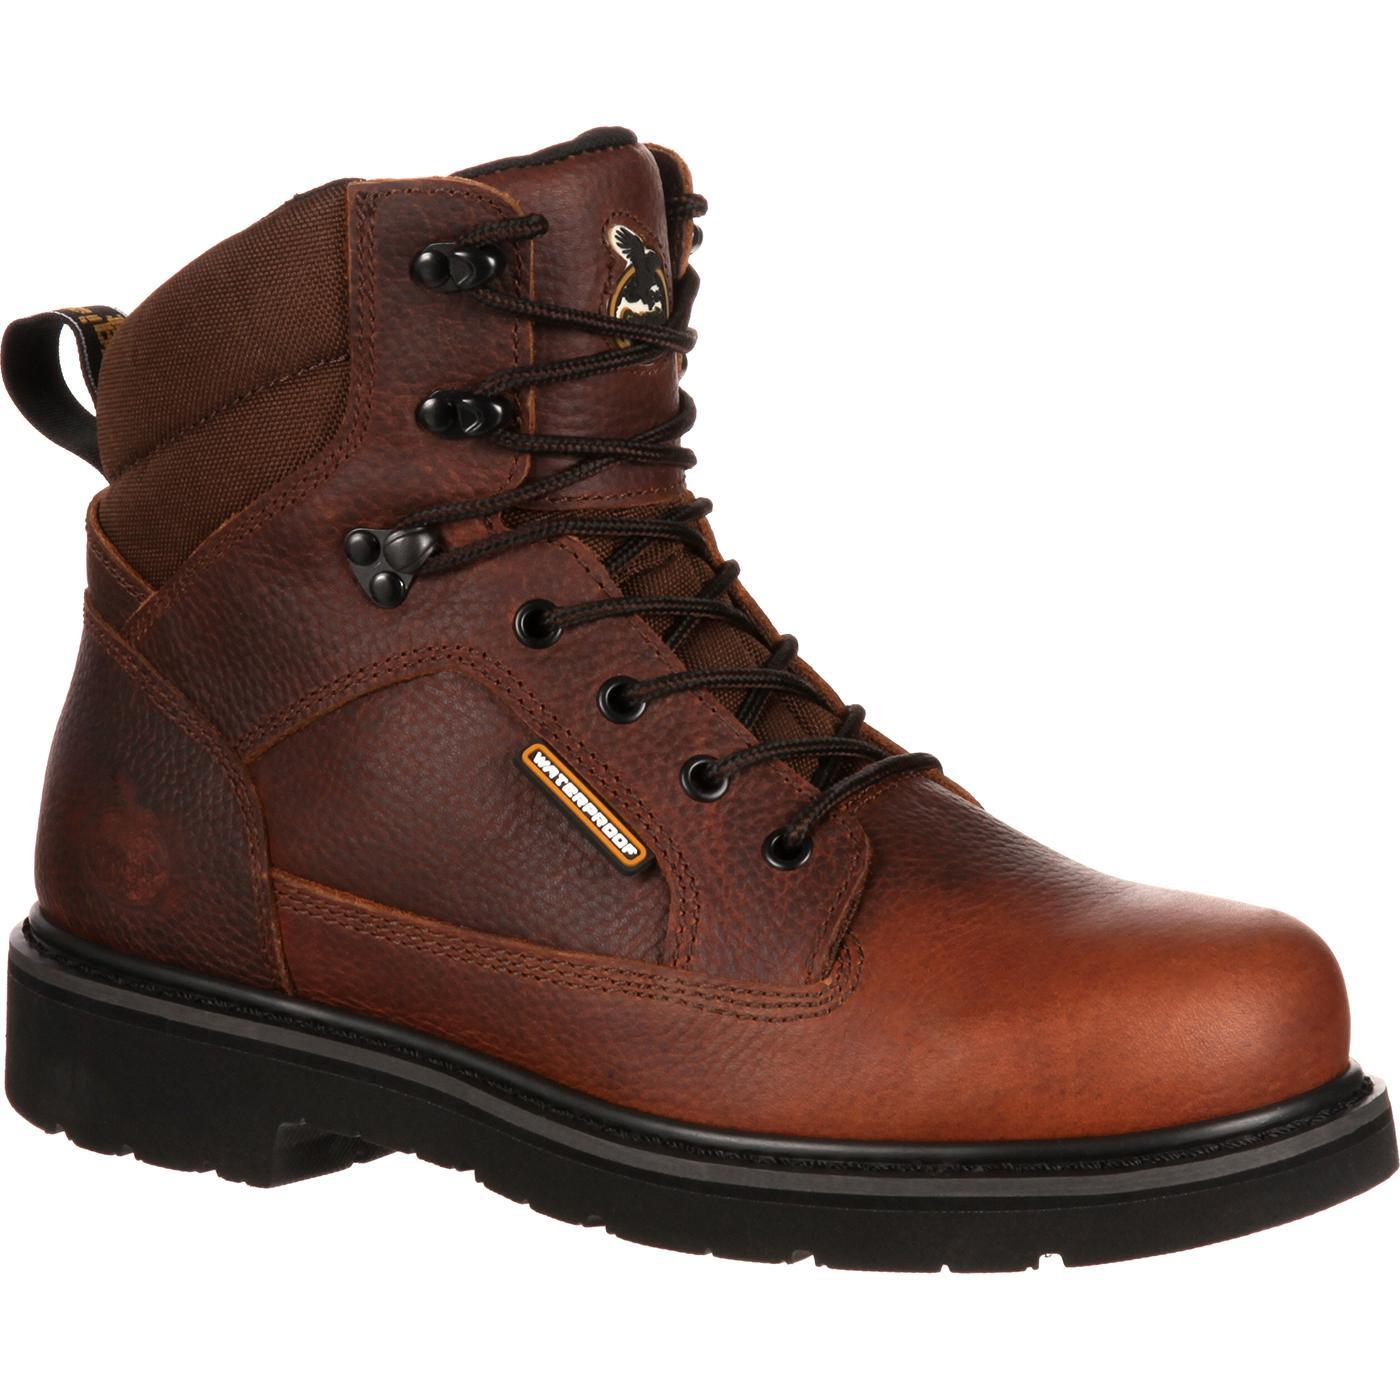 work boots georgia boot glennville waterproof work boot, , large ELALITI